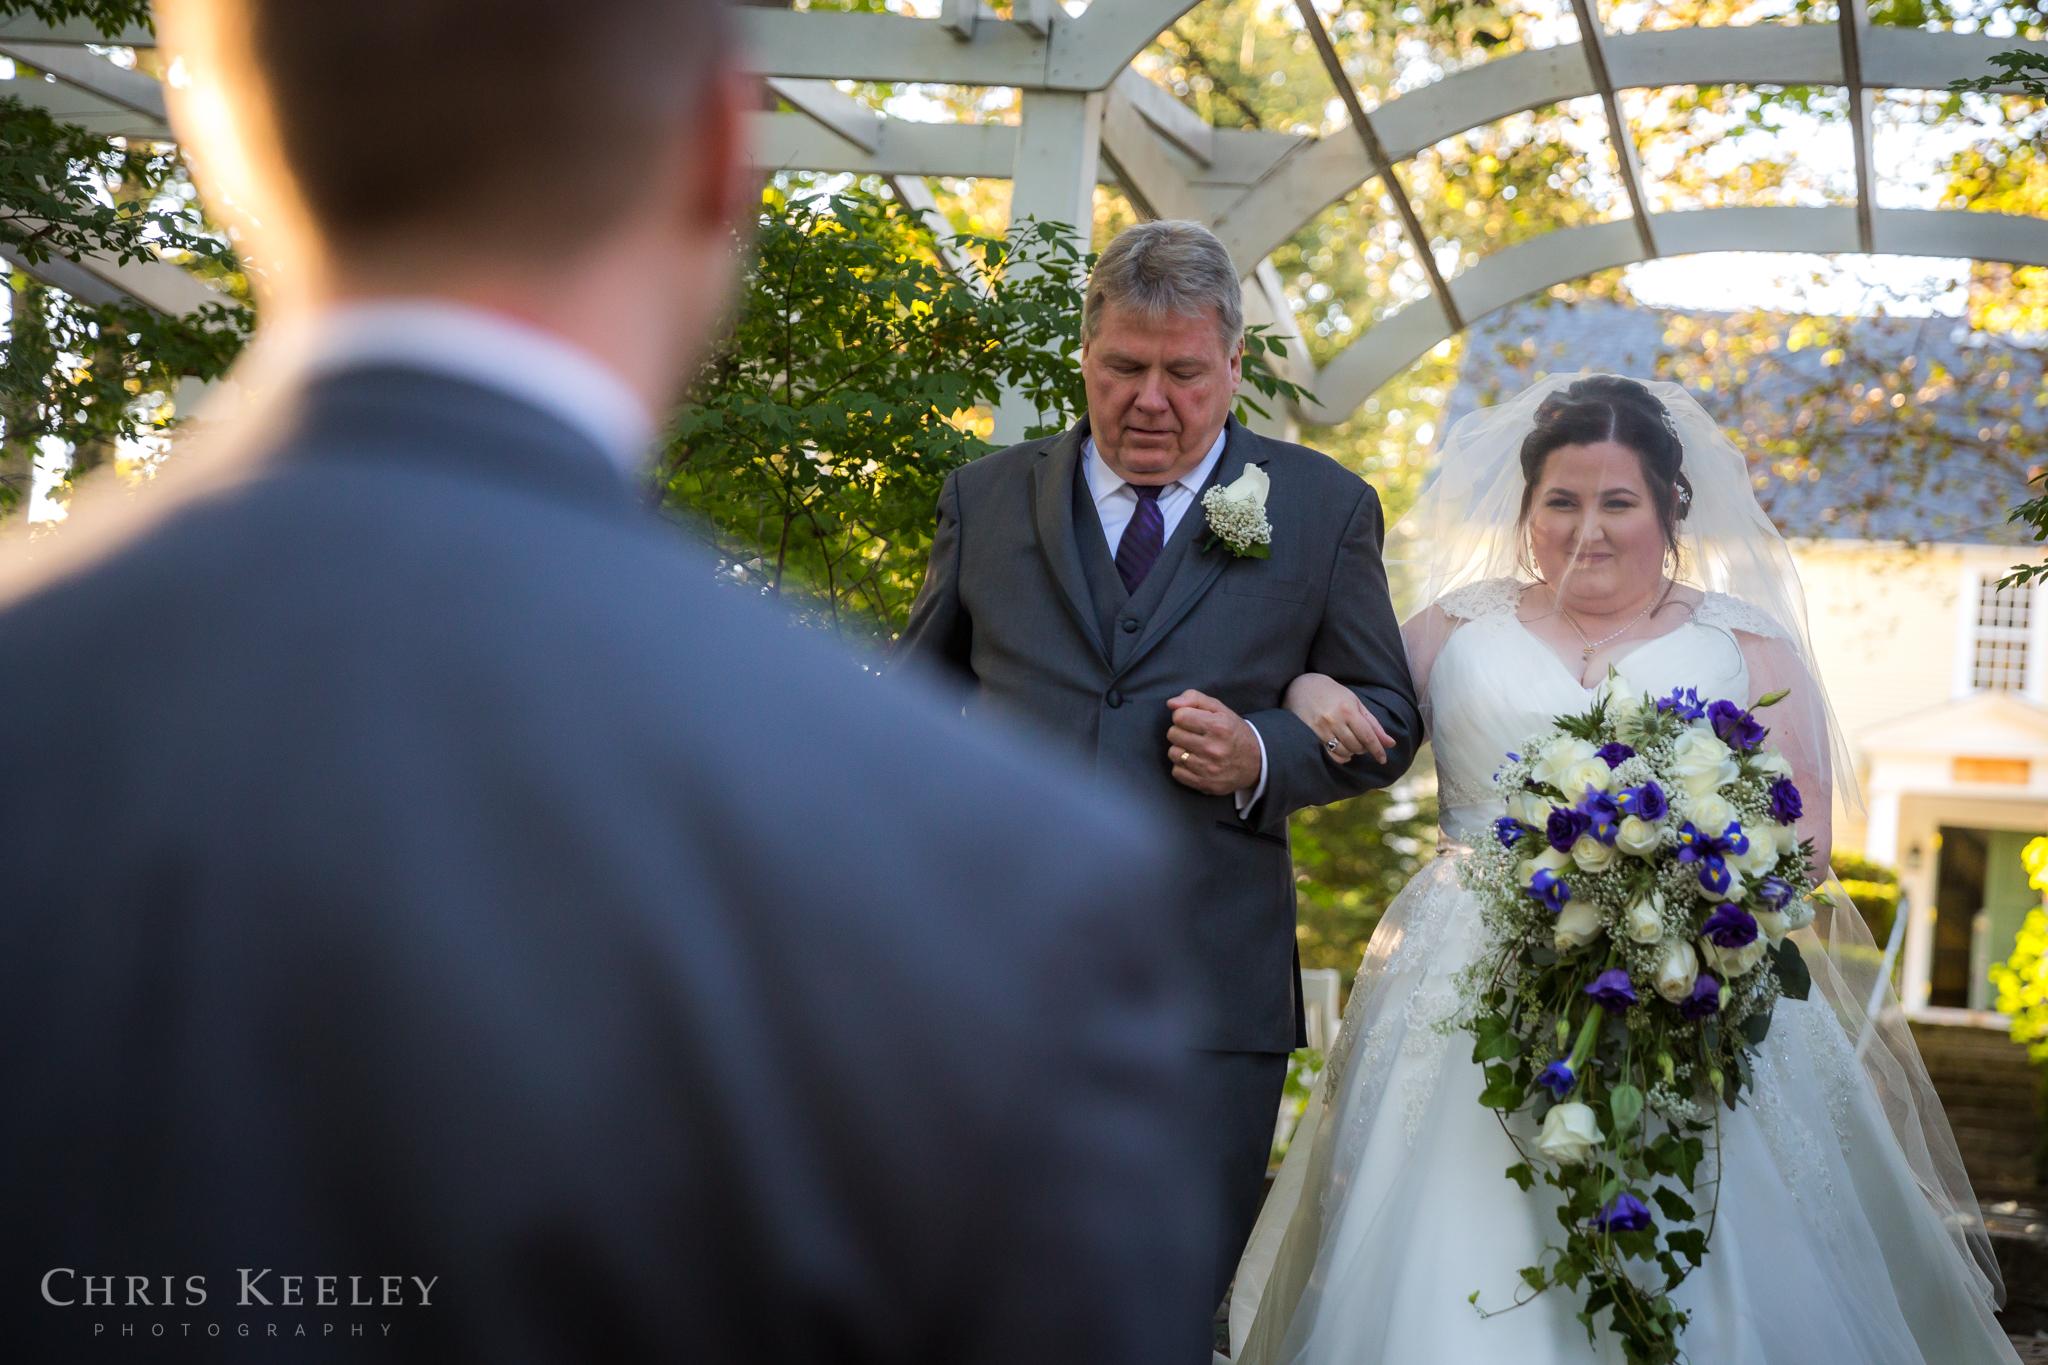 new-hampshire-wedding-photographer-three-chimneys-inn-chris-keeley-photography-12.jpg